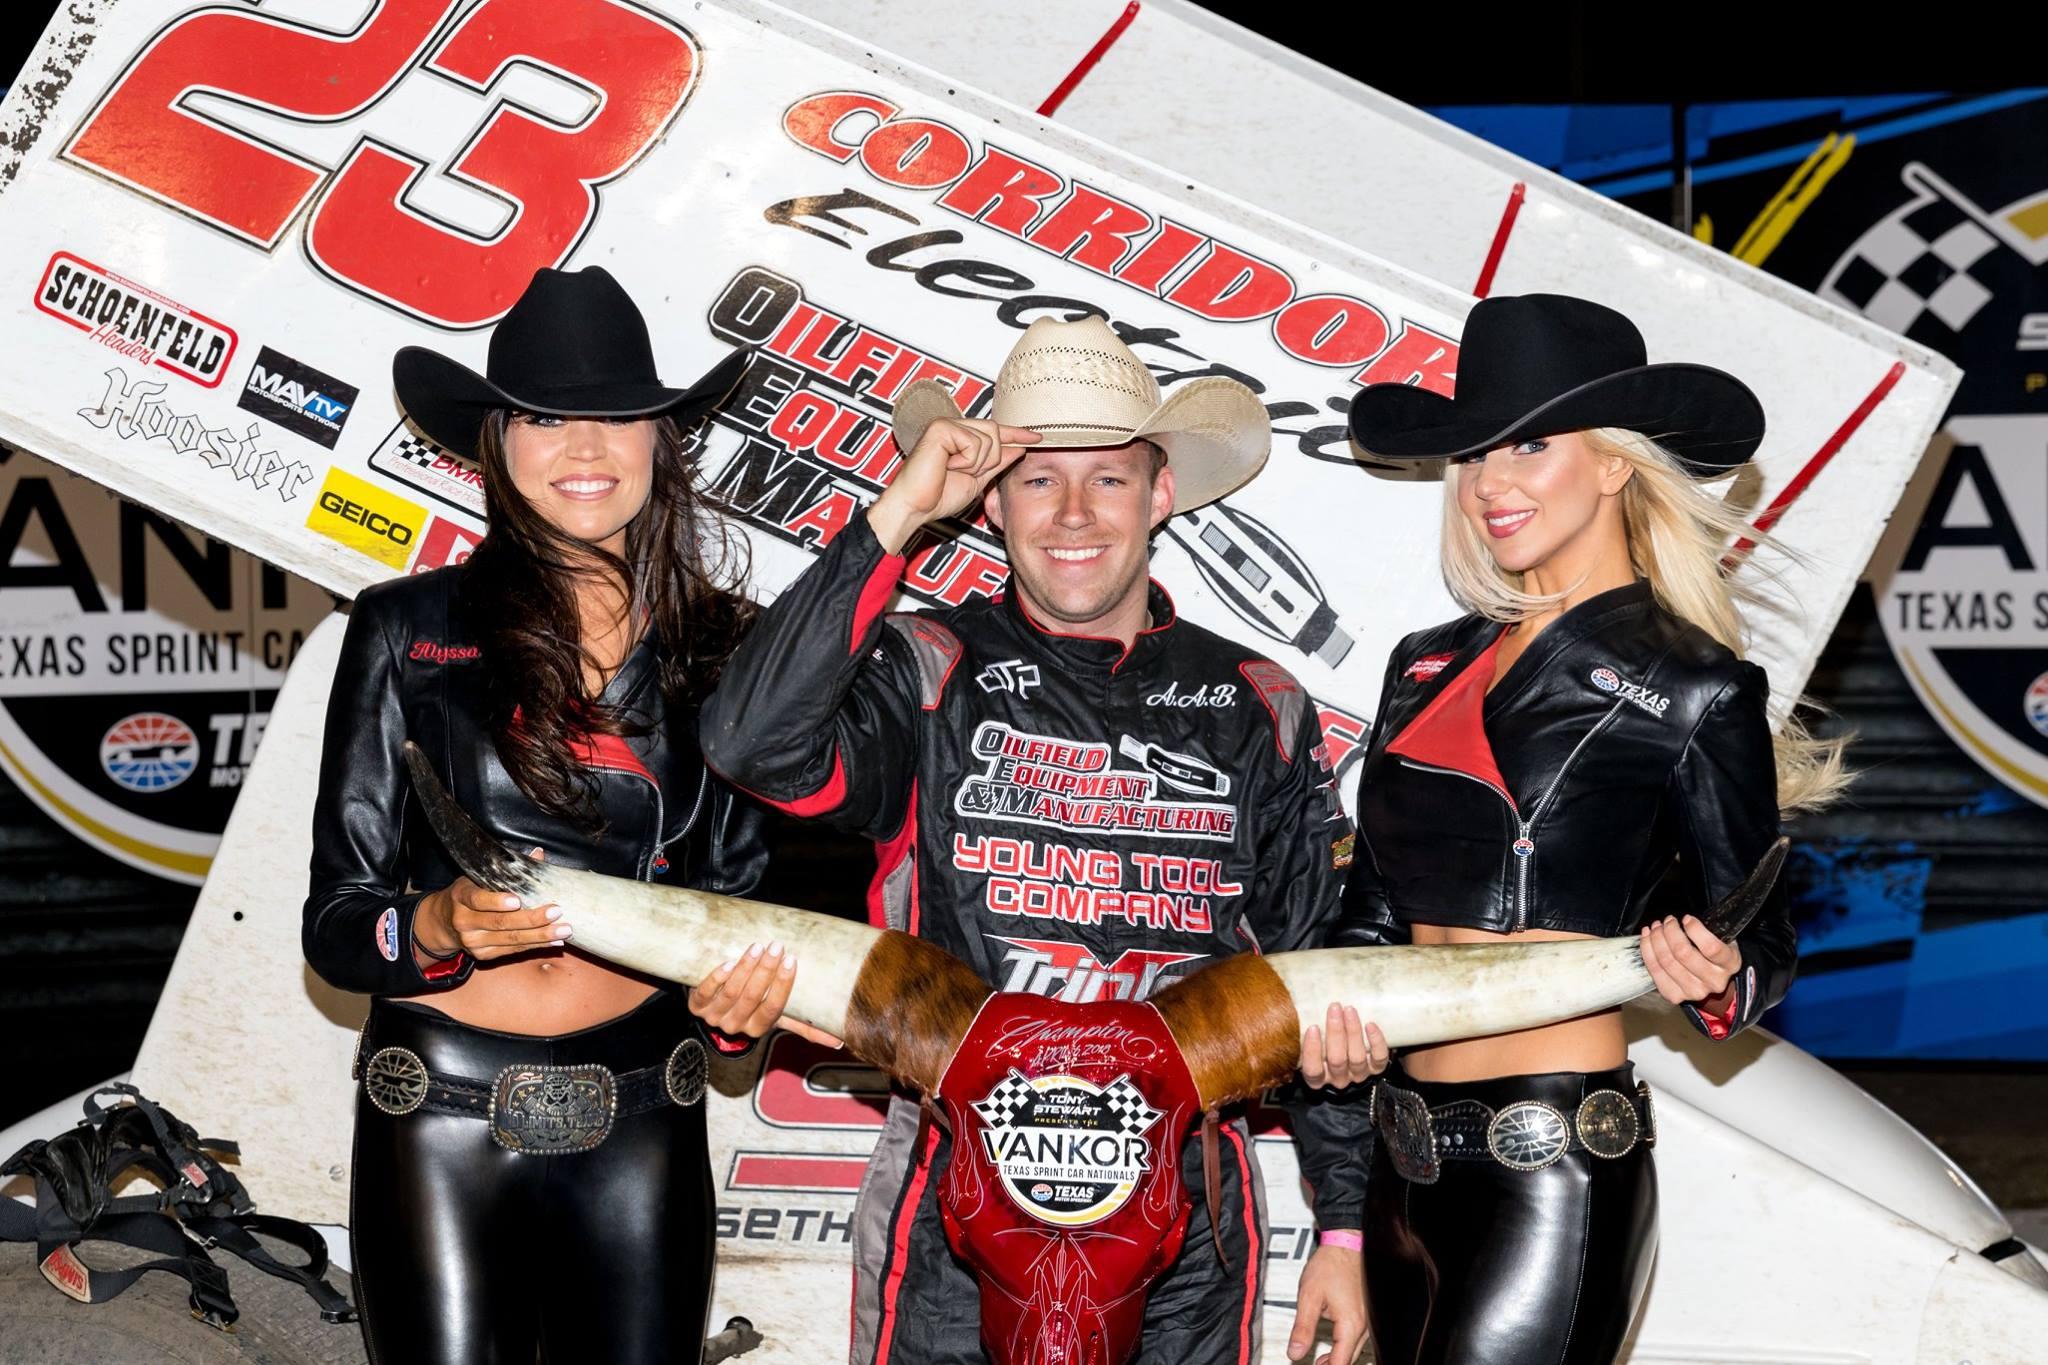 Seth Bergman wins at the Texas Motor Speedway Dirt Track